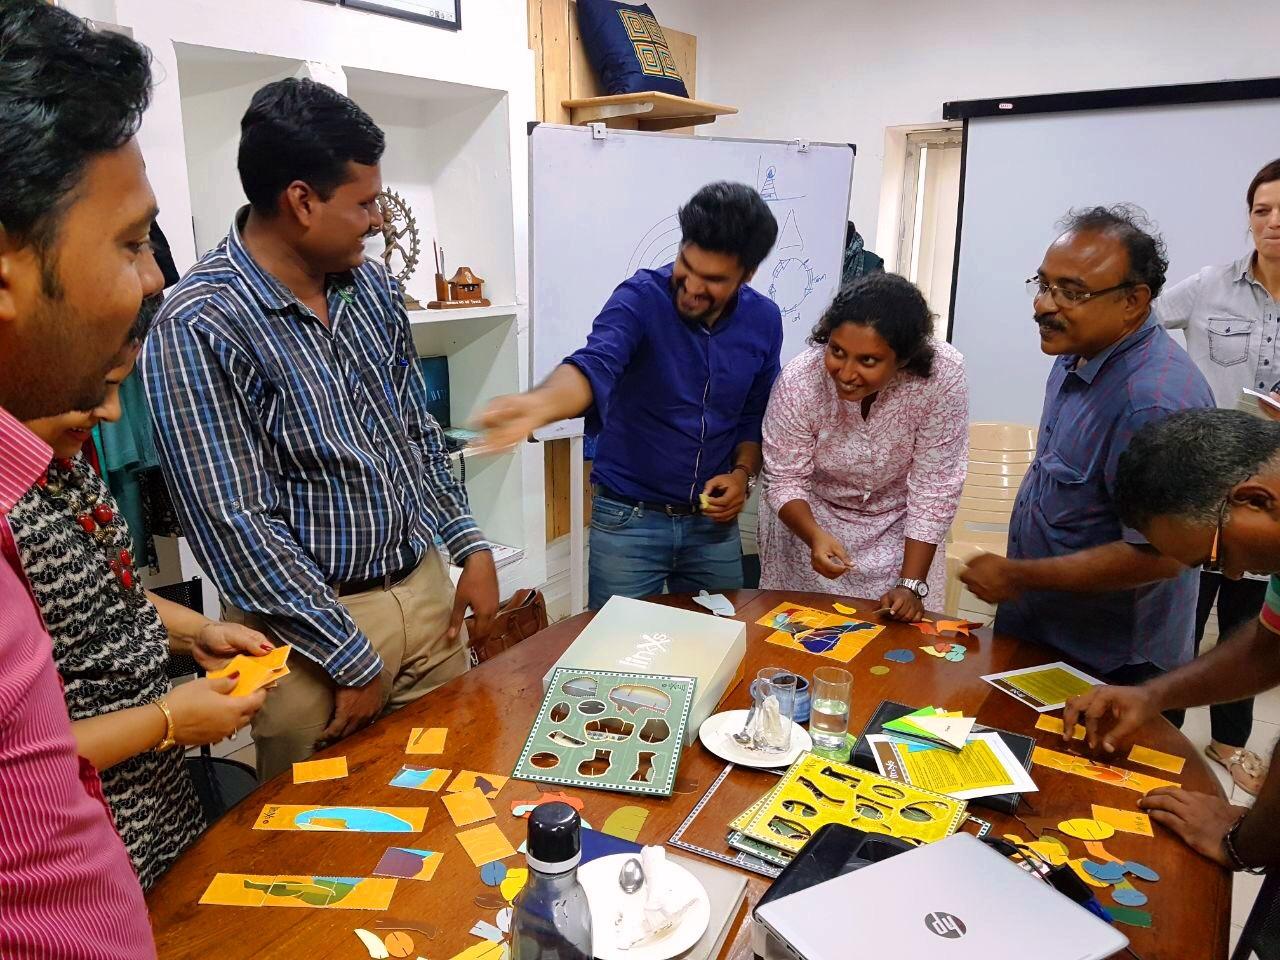 Next step in team building at Mandala